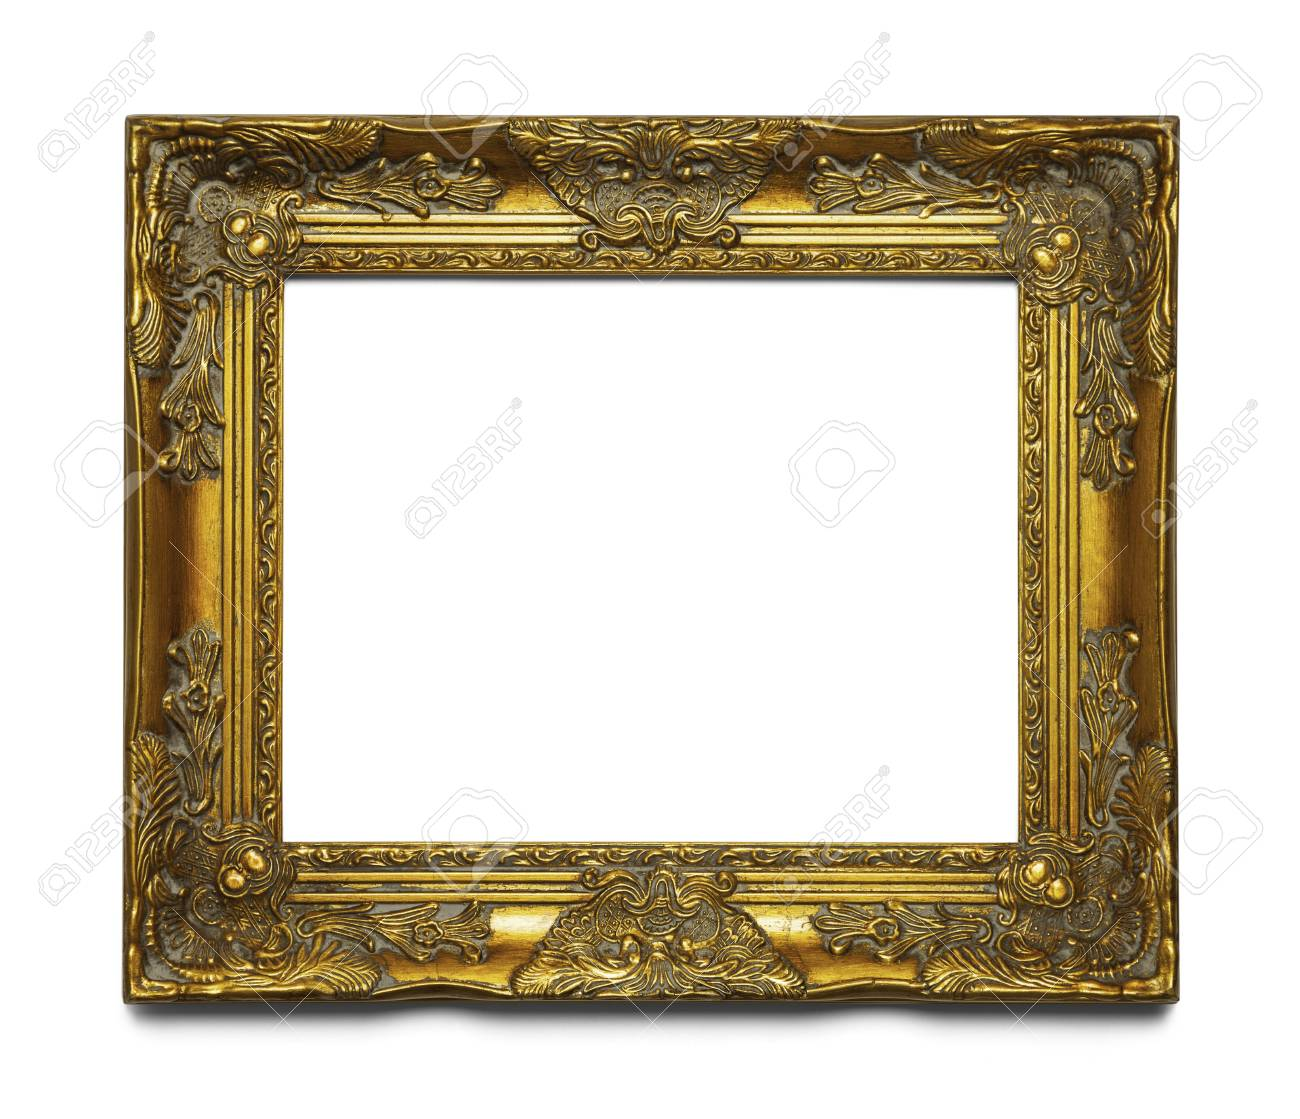 Old Gold Leaf Ornate Frame Isolated On White Background. Stock Photo ...